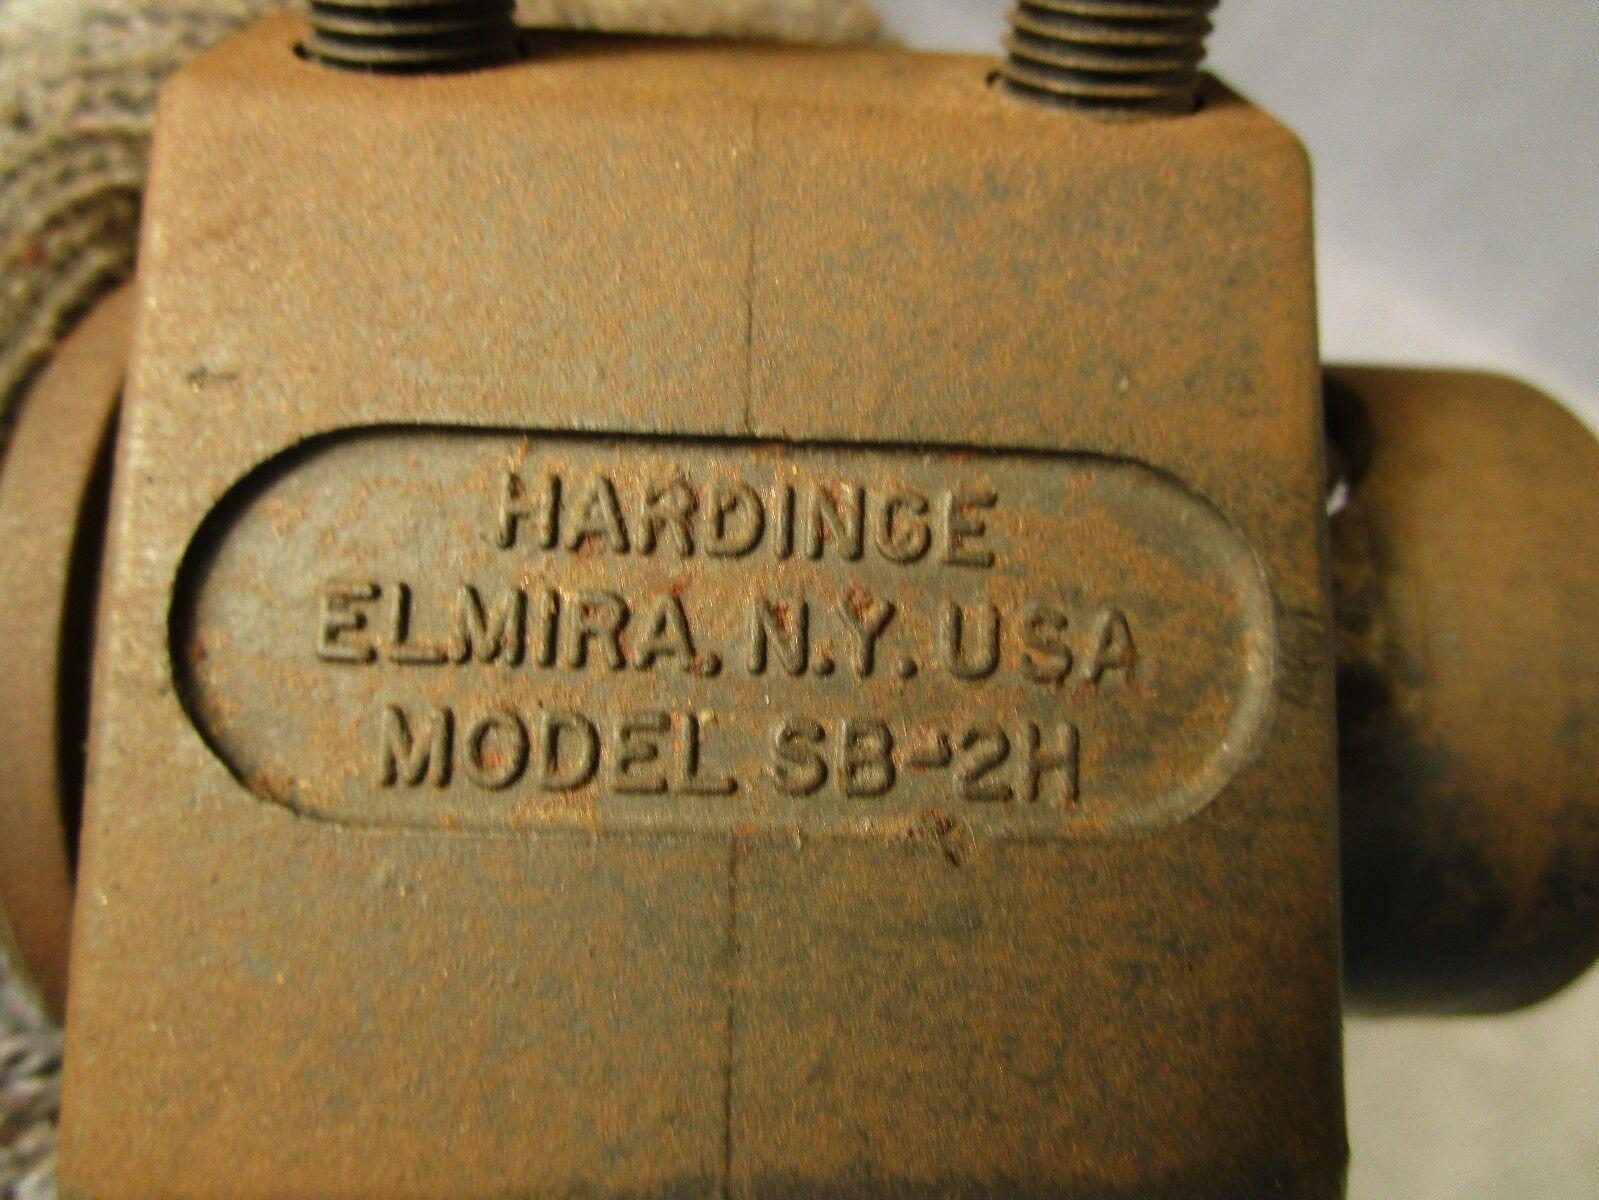 Hardinge Lathe Tool Holder Blocks (2) SB-11 & (1) SB-2H Super Slant Tool Block